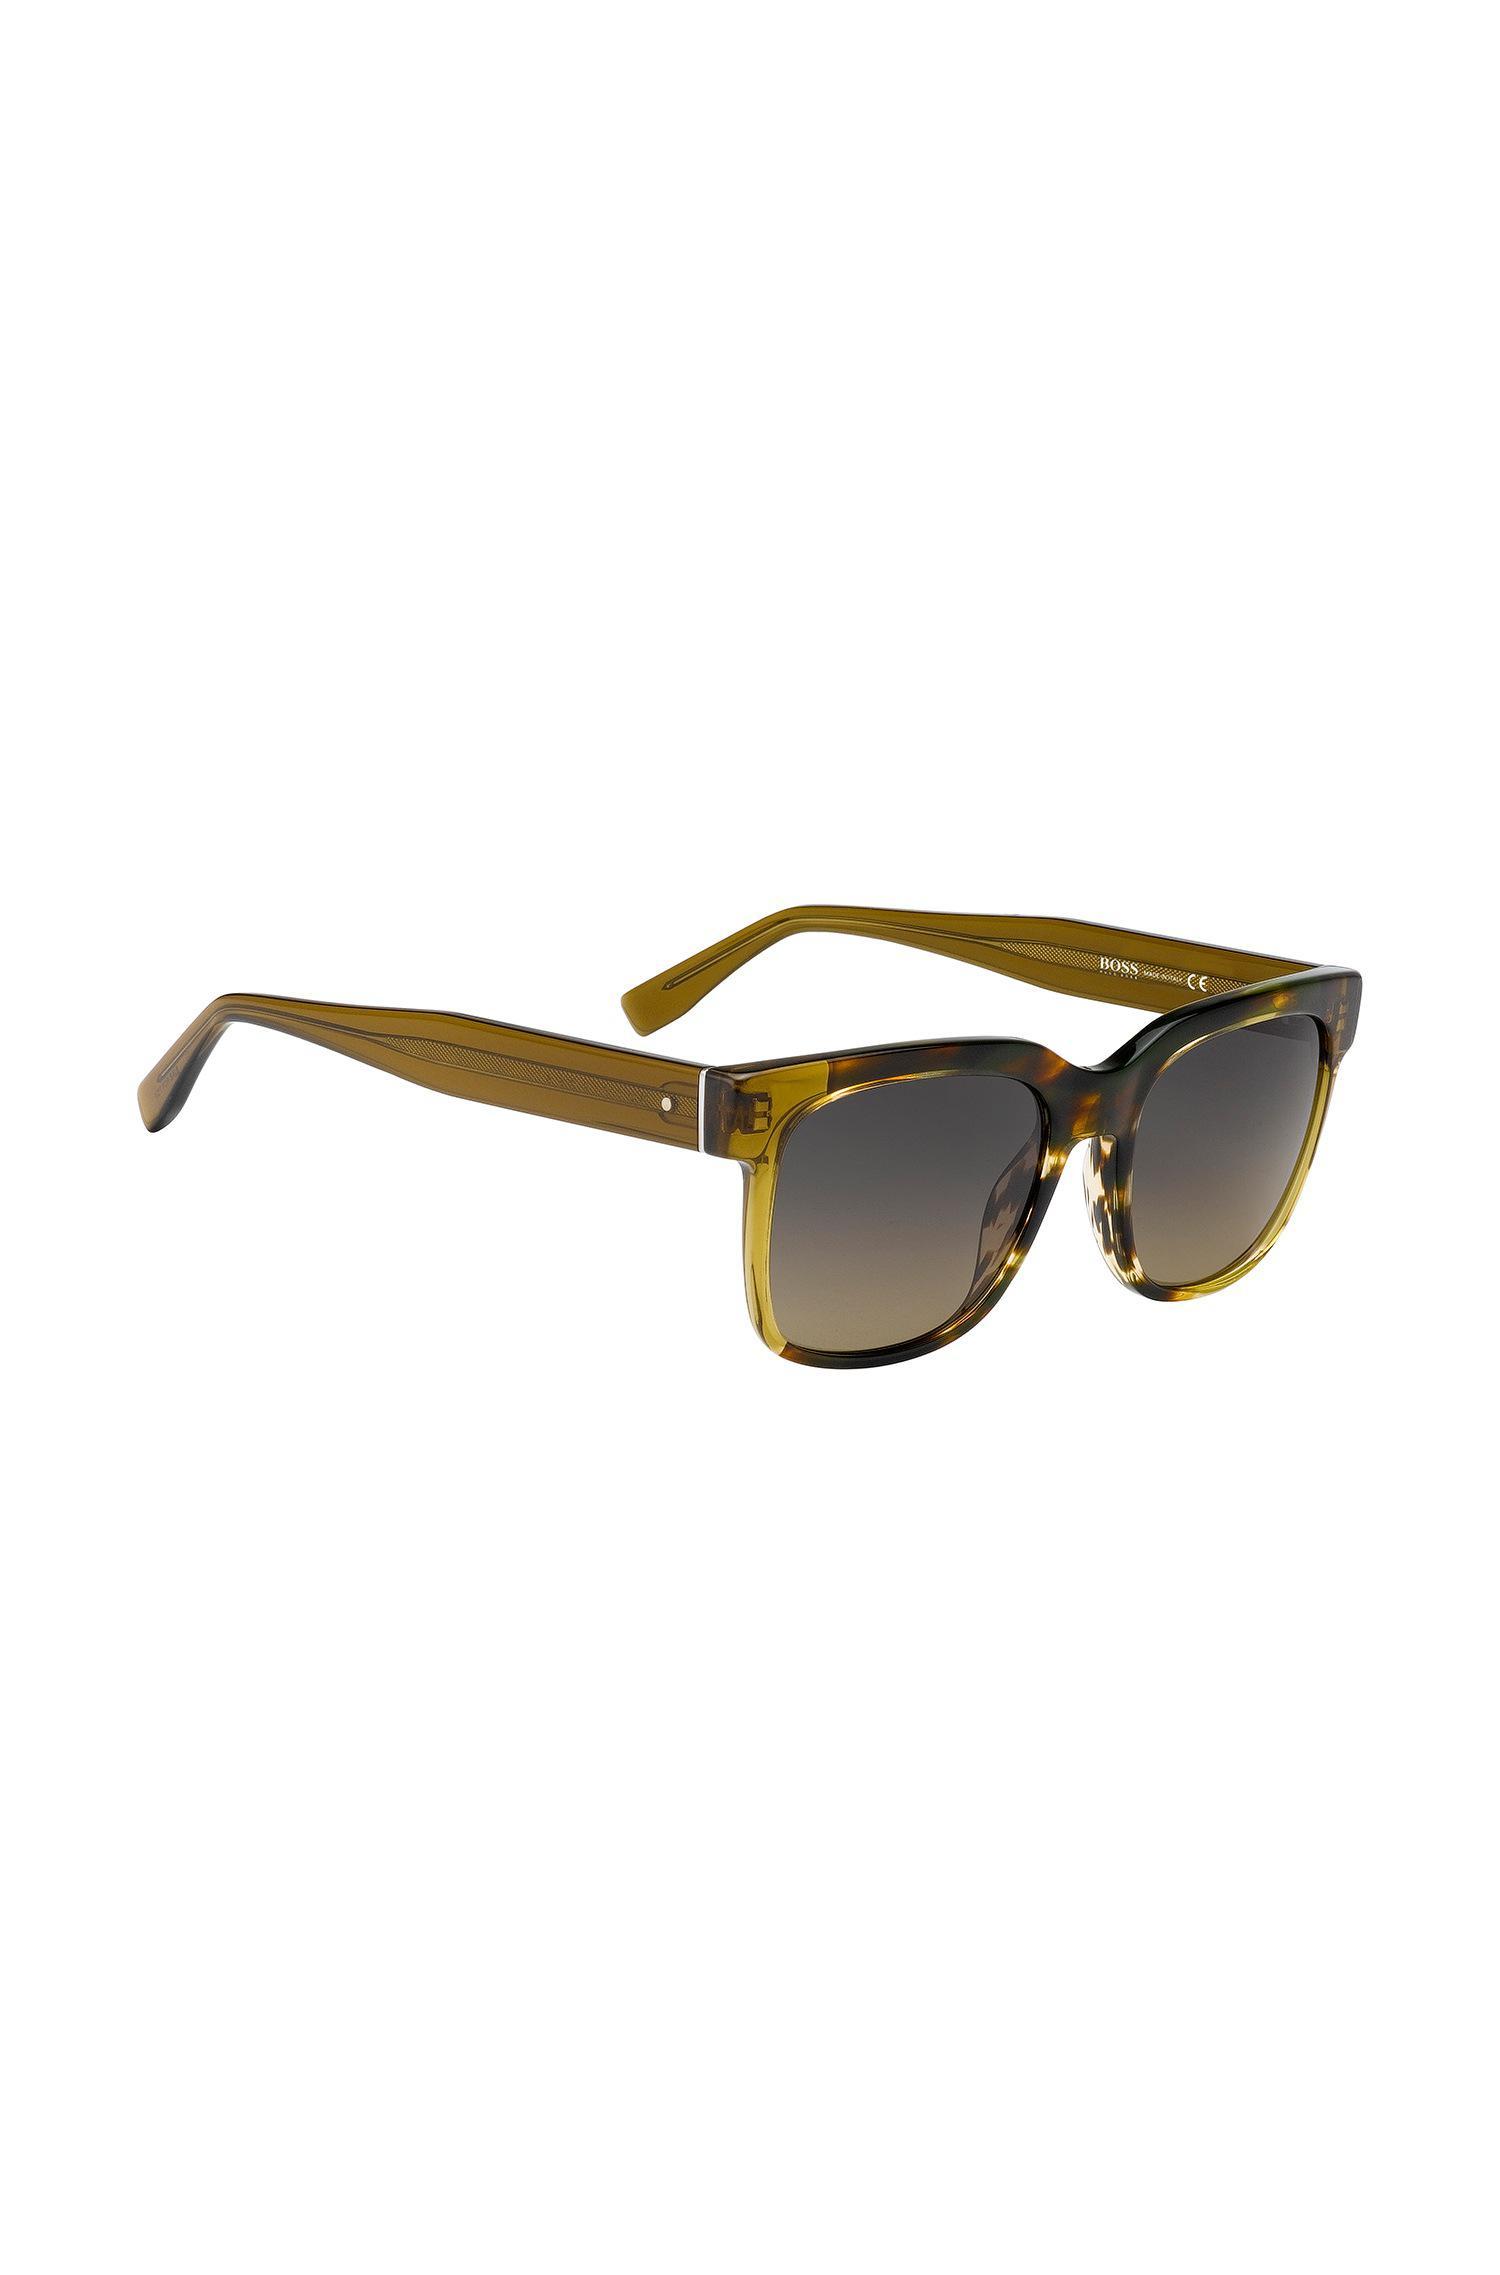 79c1b38374 Lyst - Boss Gradient Lens Acetate Sunglasses